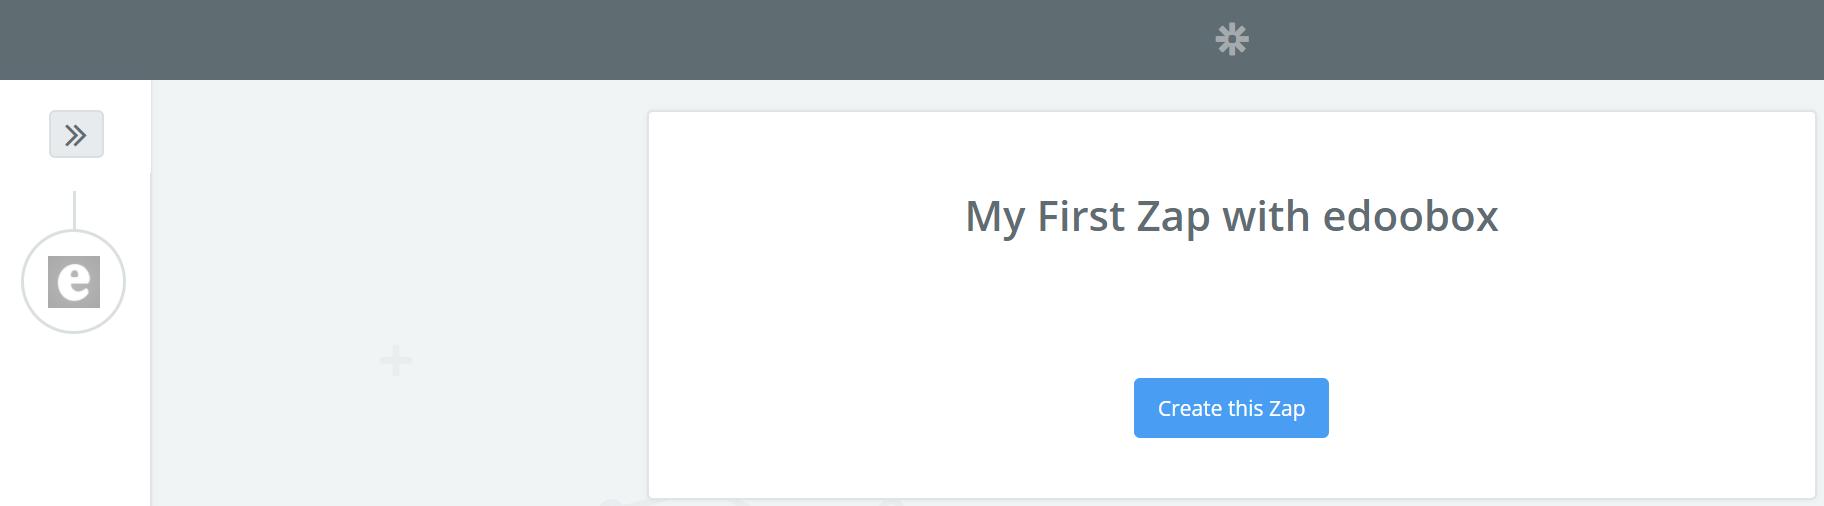 First Zap estellen